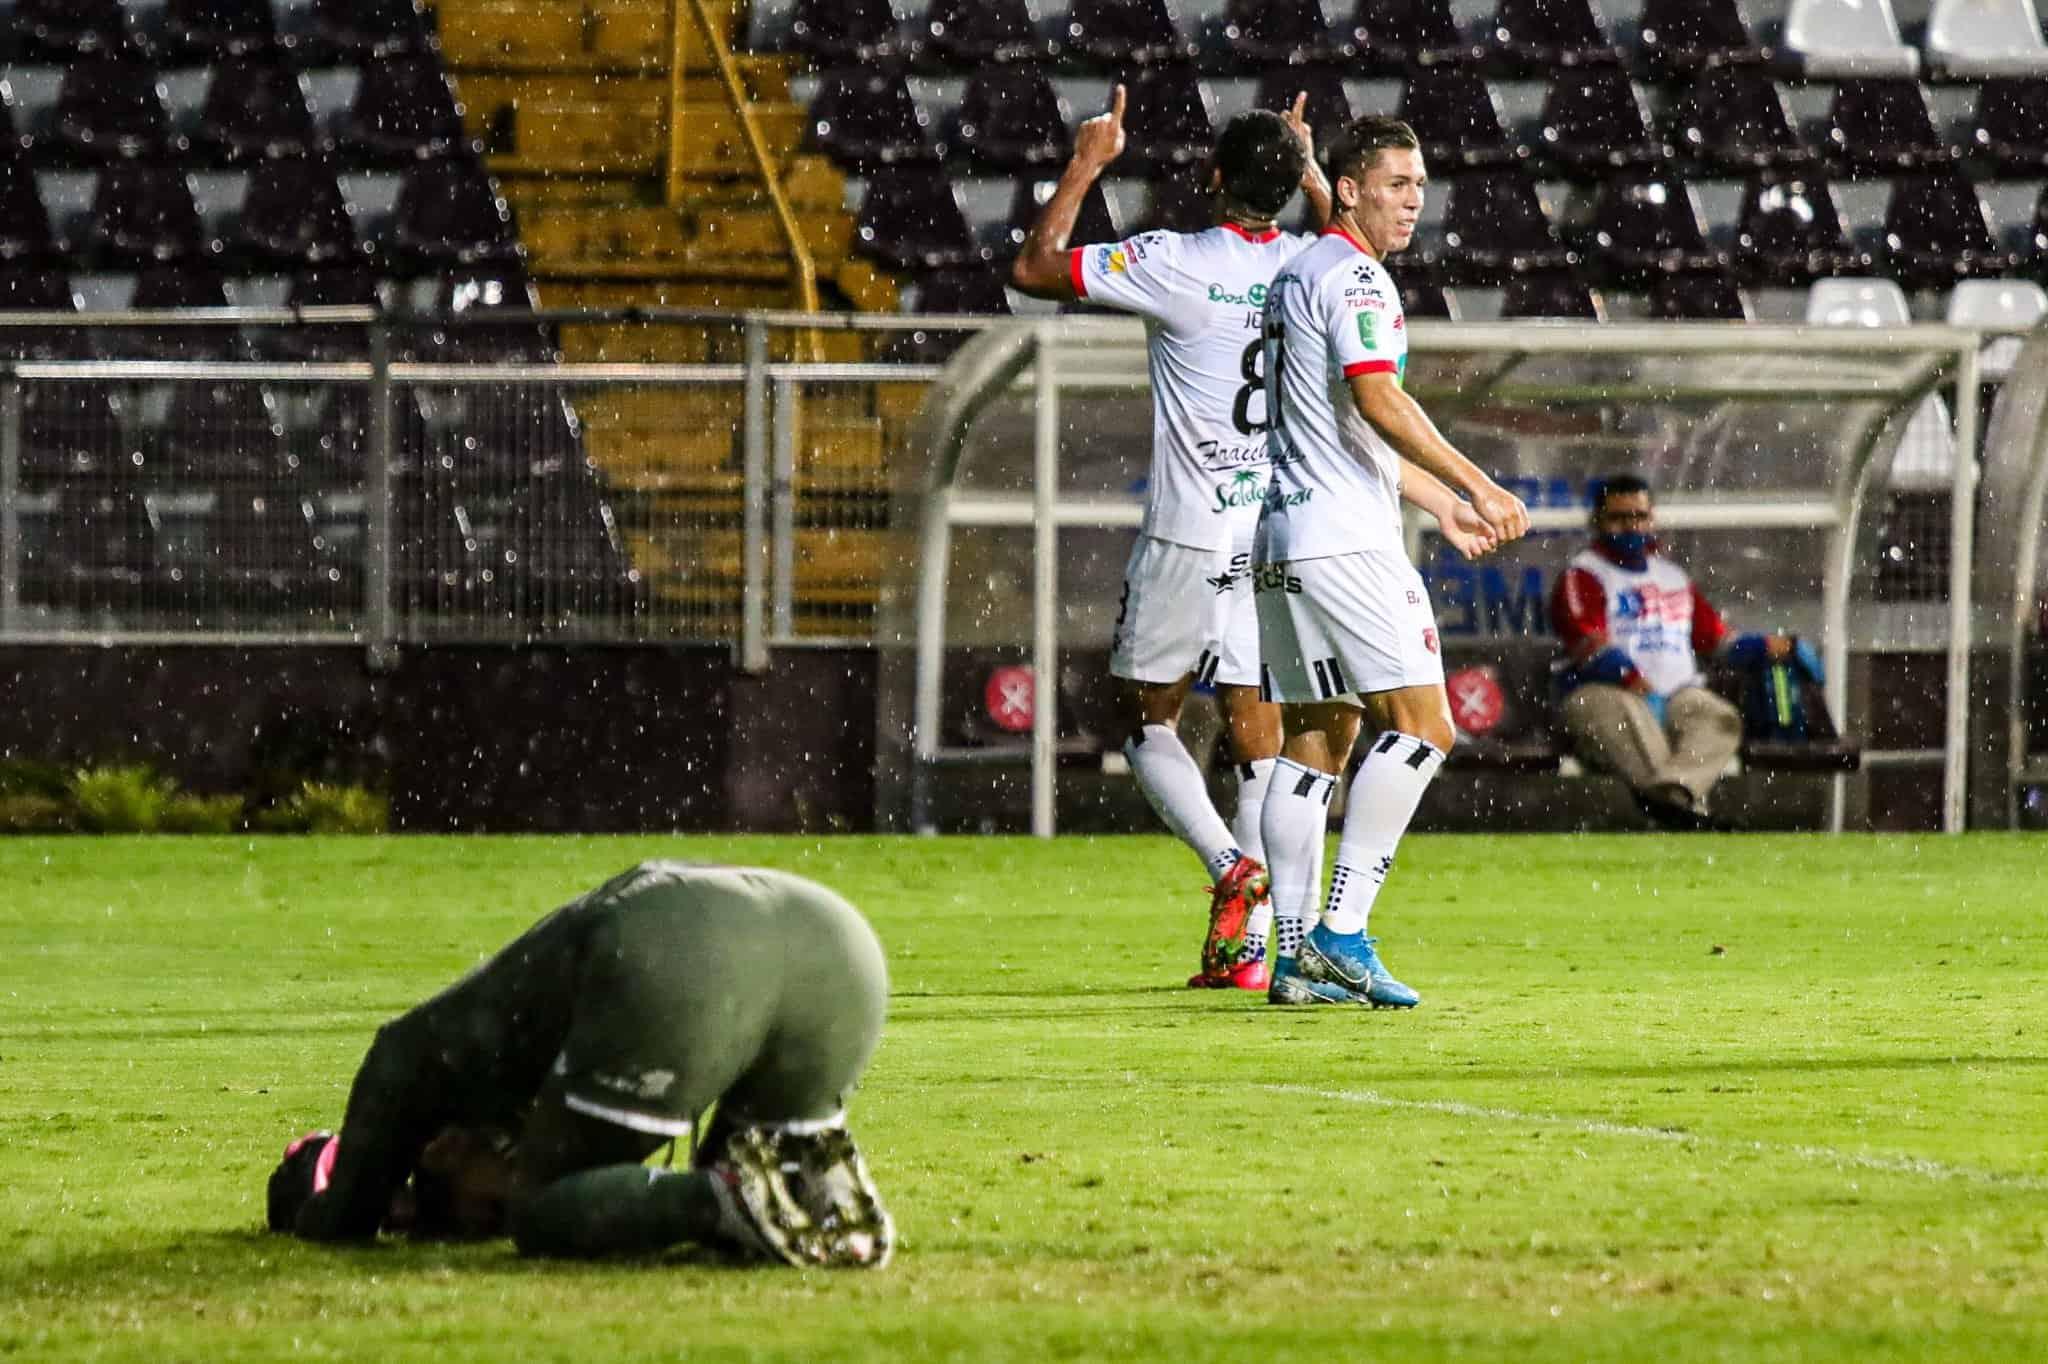 Liga Deportiva Alajuelense celebrates a 5-0 victory over Saprissa in Tibás.